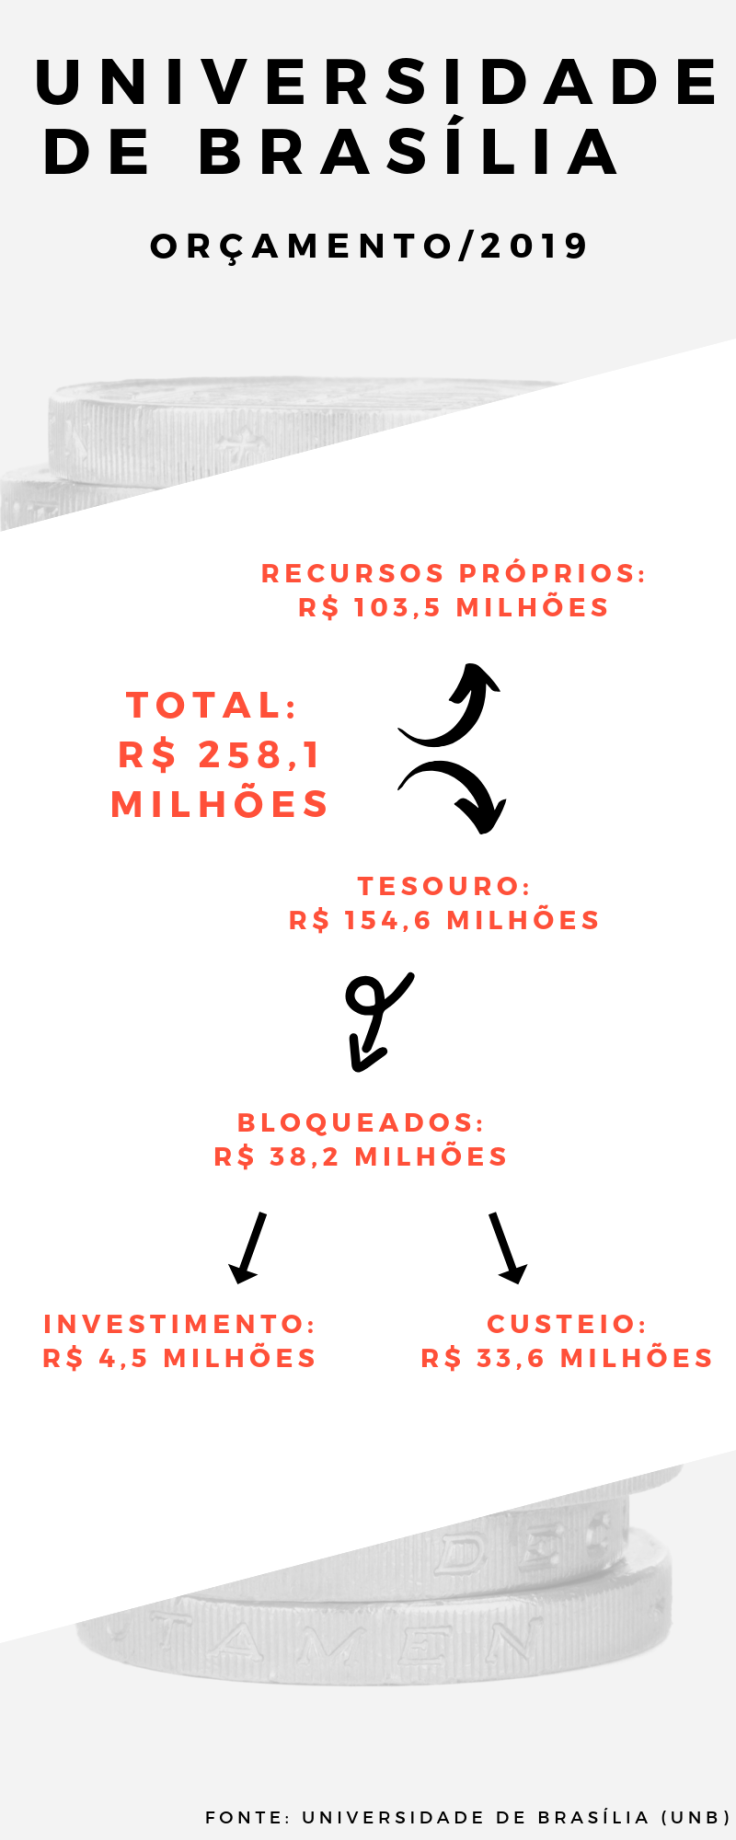 INFOGRÁFICO (Orçamento UnB para 2019)